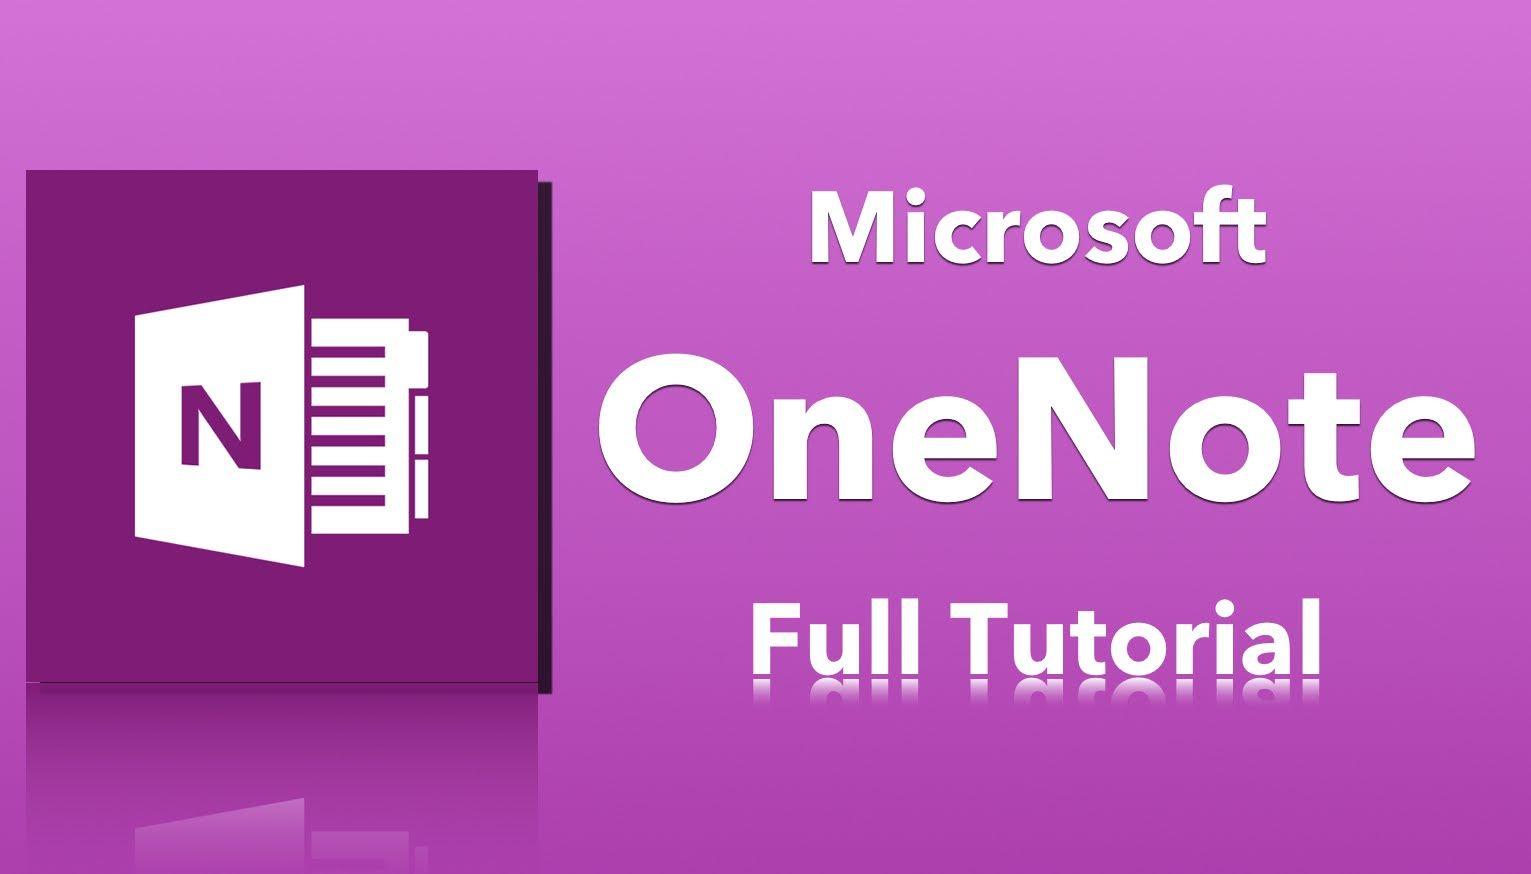 Microsoft onenote tutorial pinteres microsoft onenote tutorial more baditri Choice Image